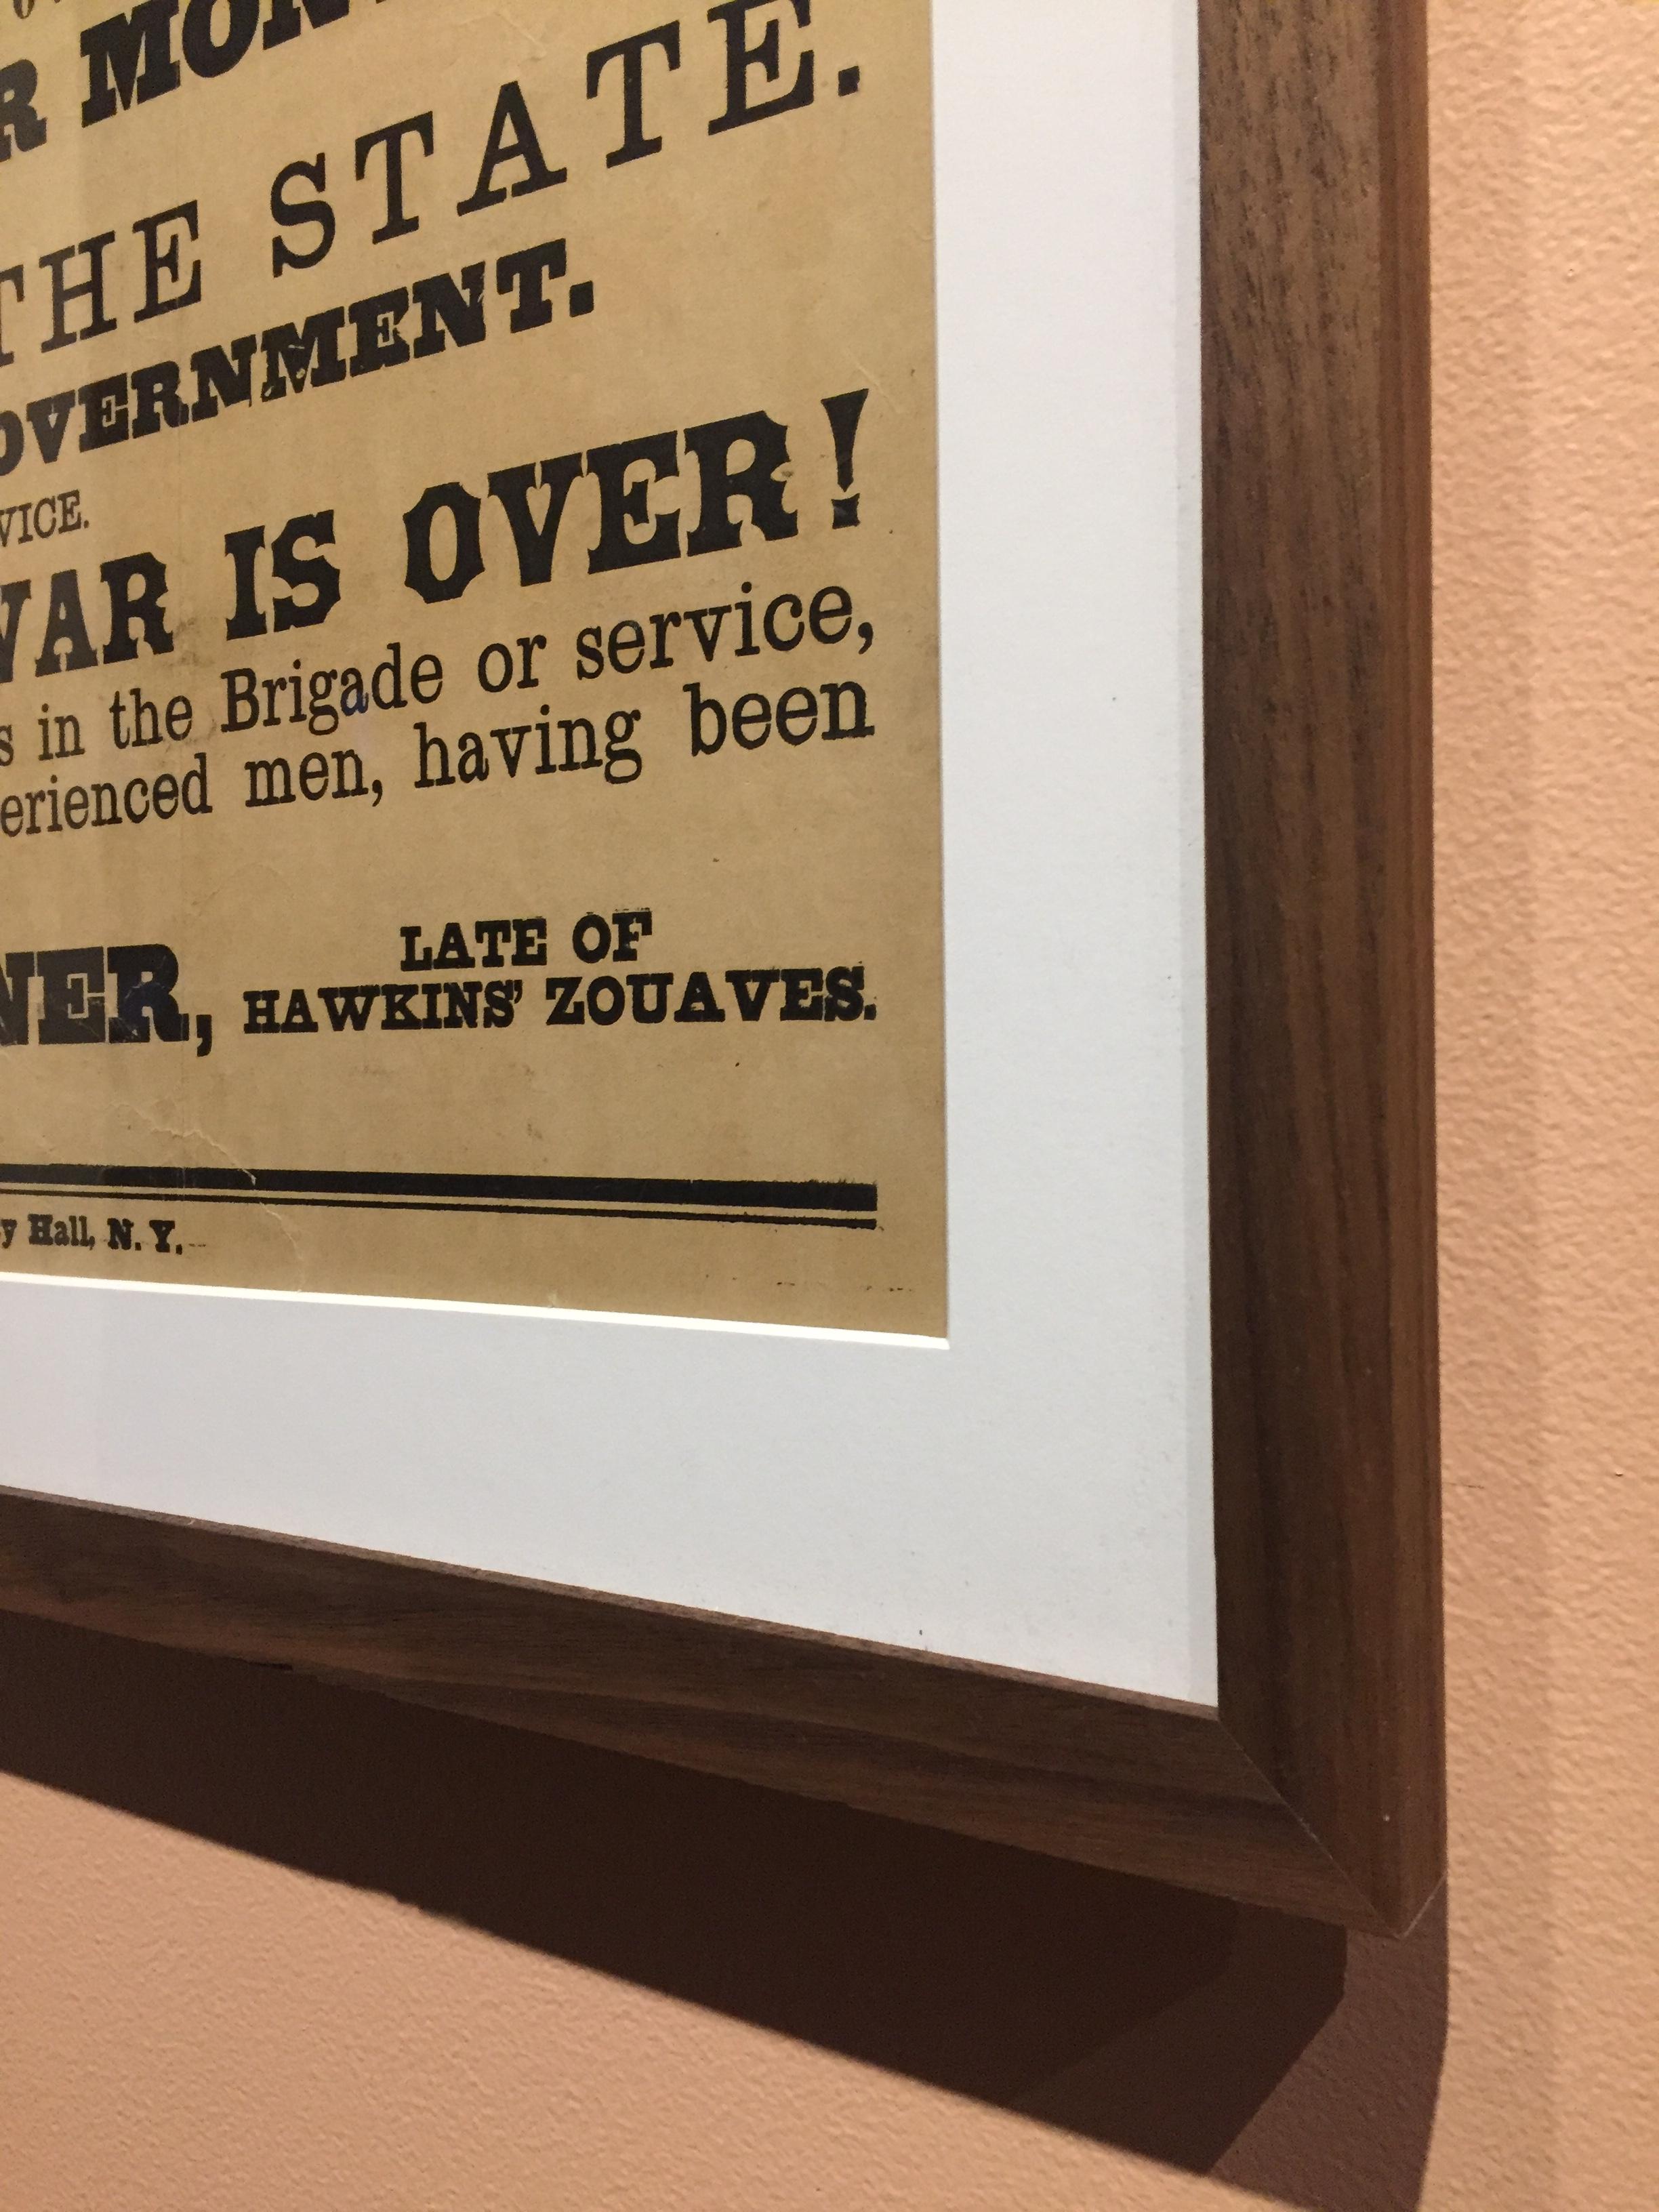 causes of war propaganda posters (2).JPG